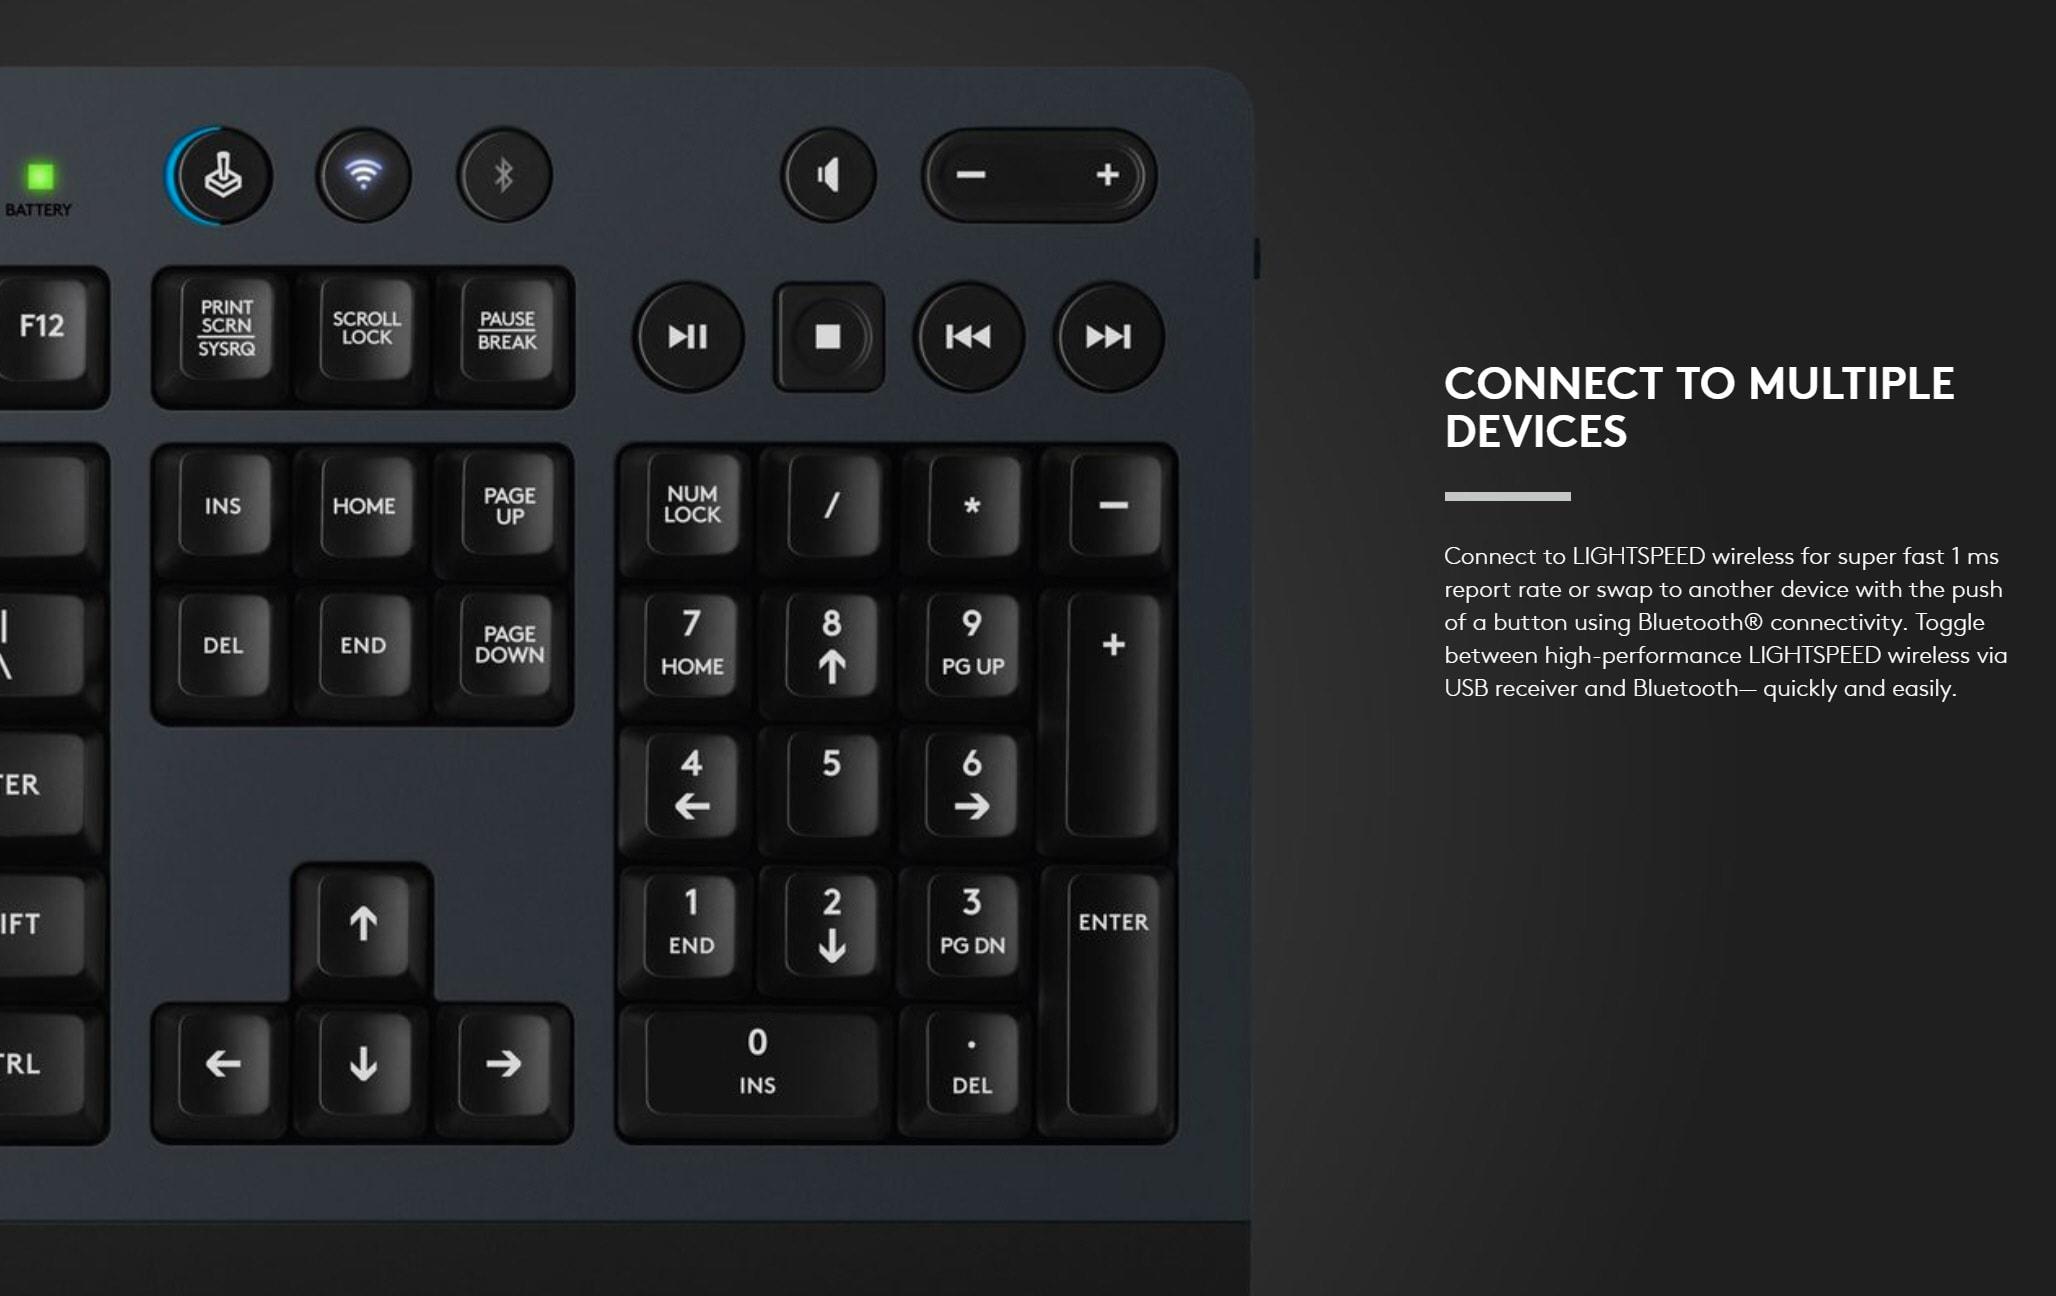 Logitech G613 Review - Finally, a Wireless Mechanical Gaming Keyboard!